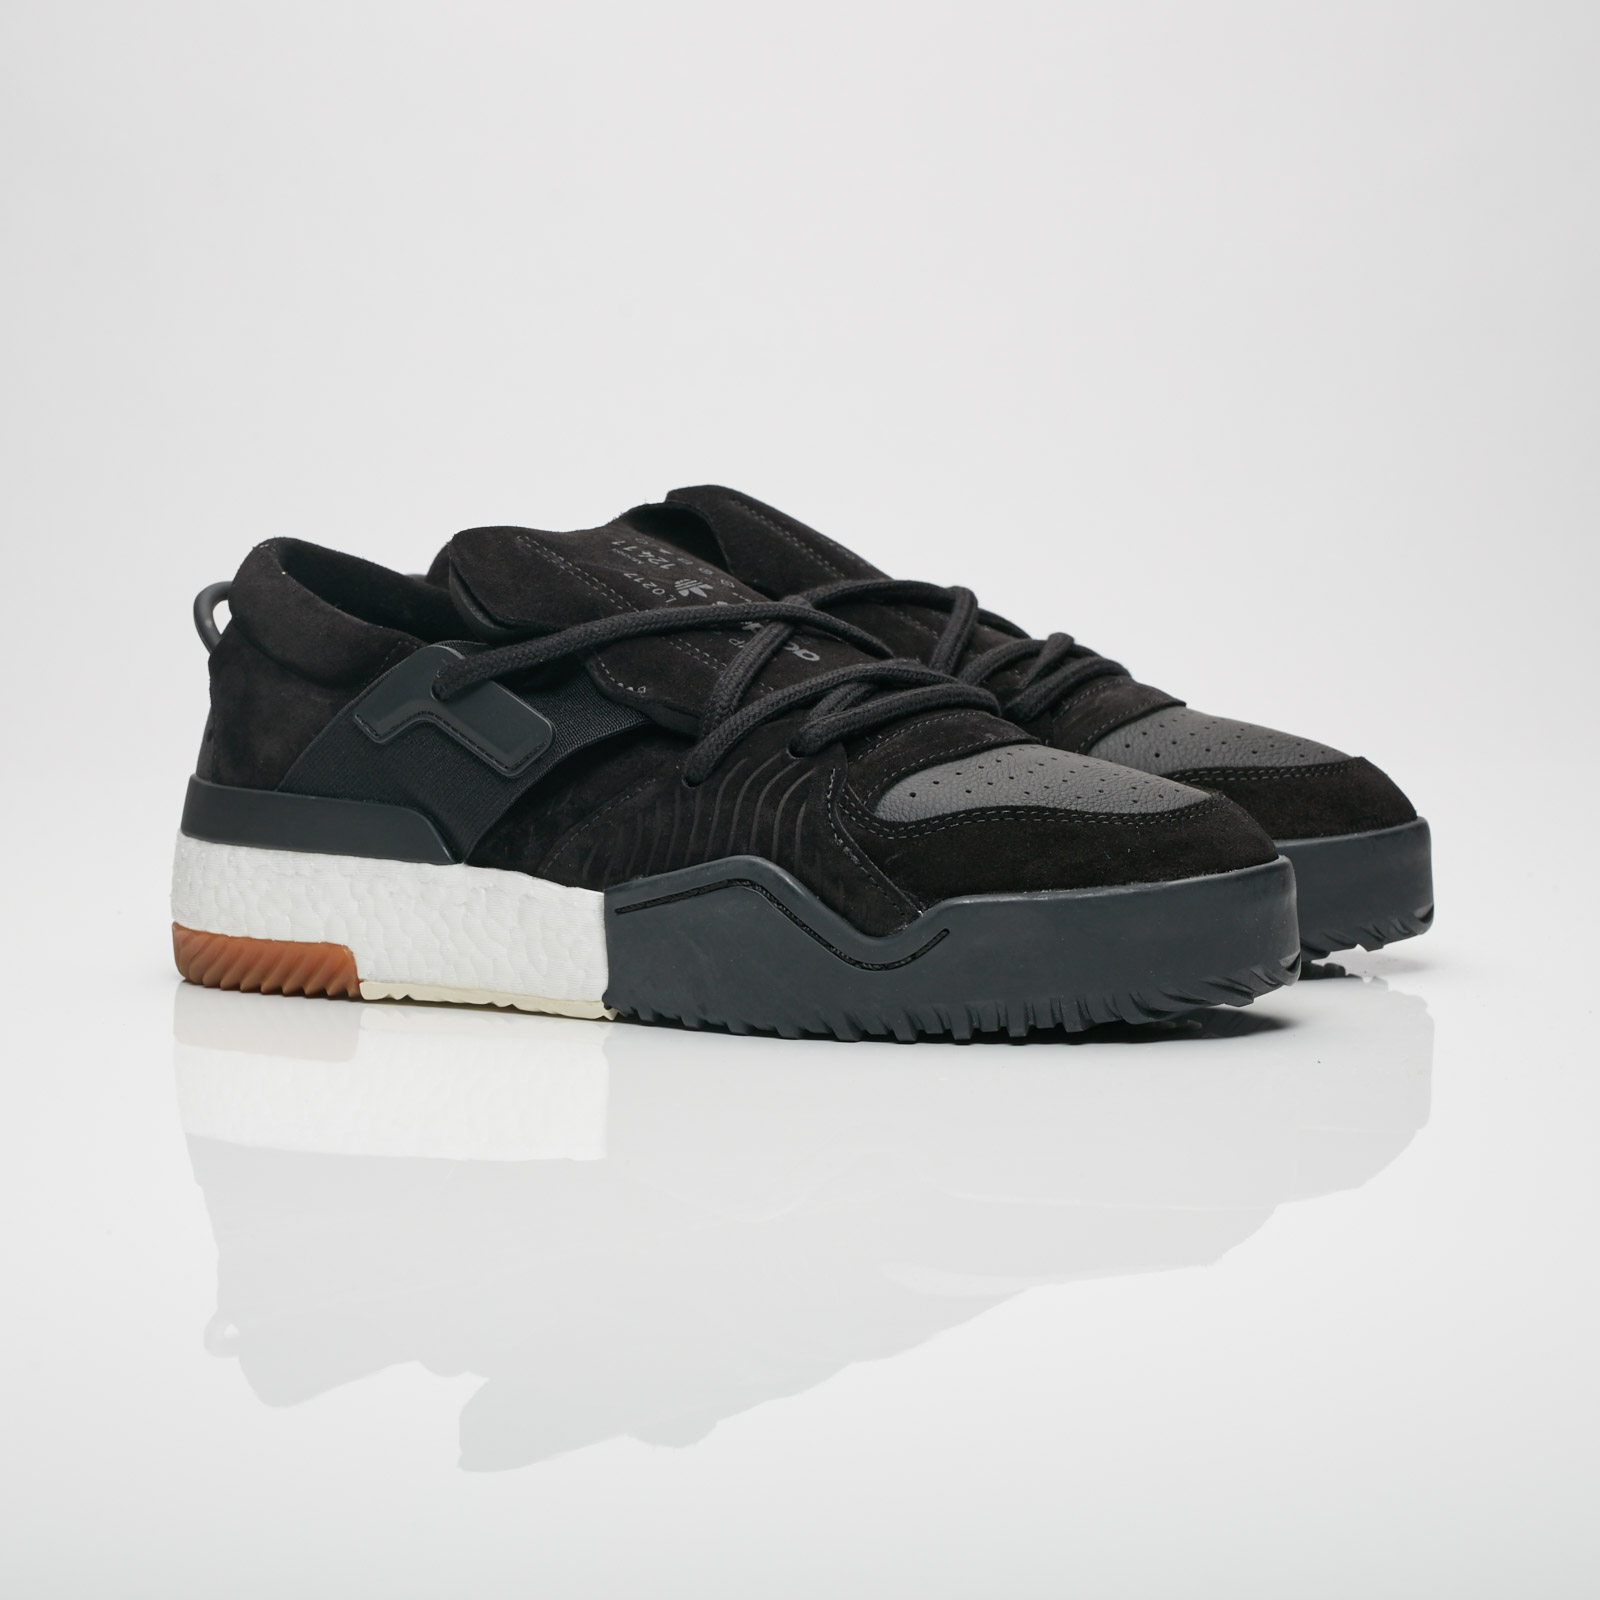 42c8d092903 adidas Originals by Alexander Wang Basketball Shoes